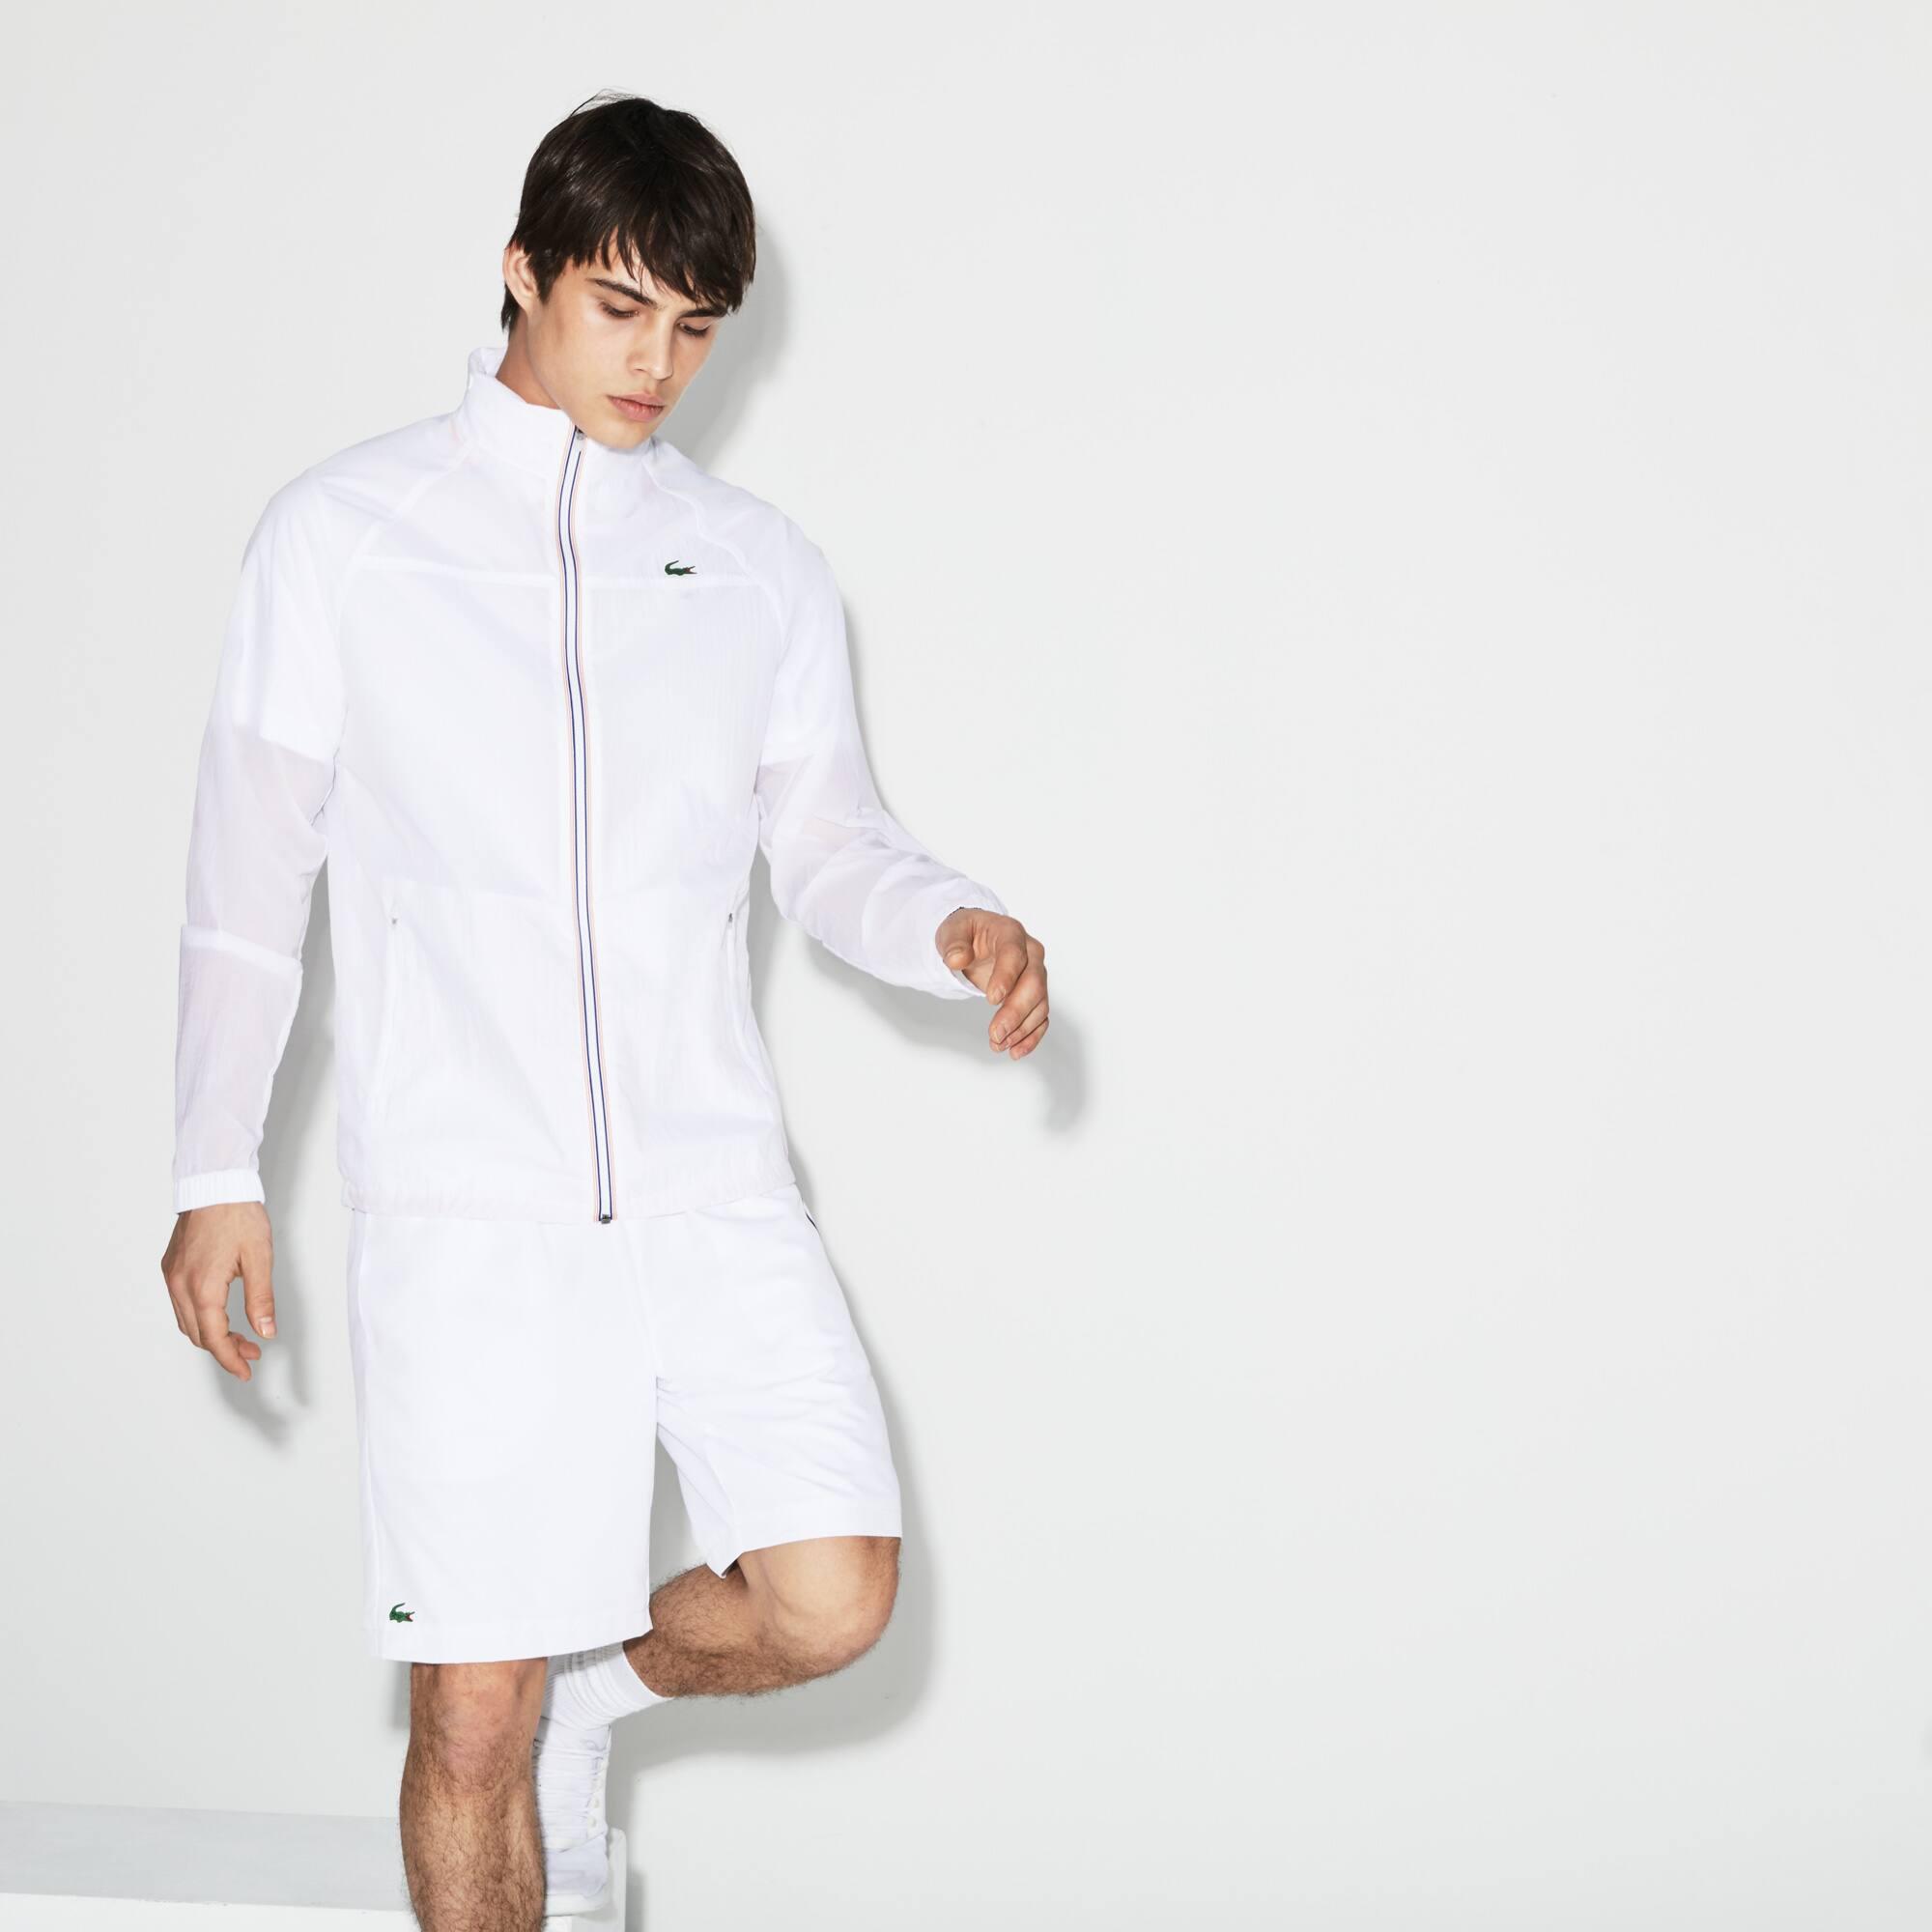 Cortavientos técnico Tenis Lacoste SPORT con capucha oculta